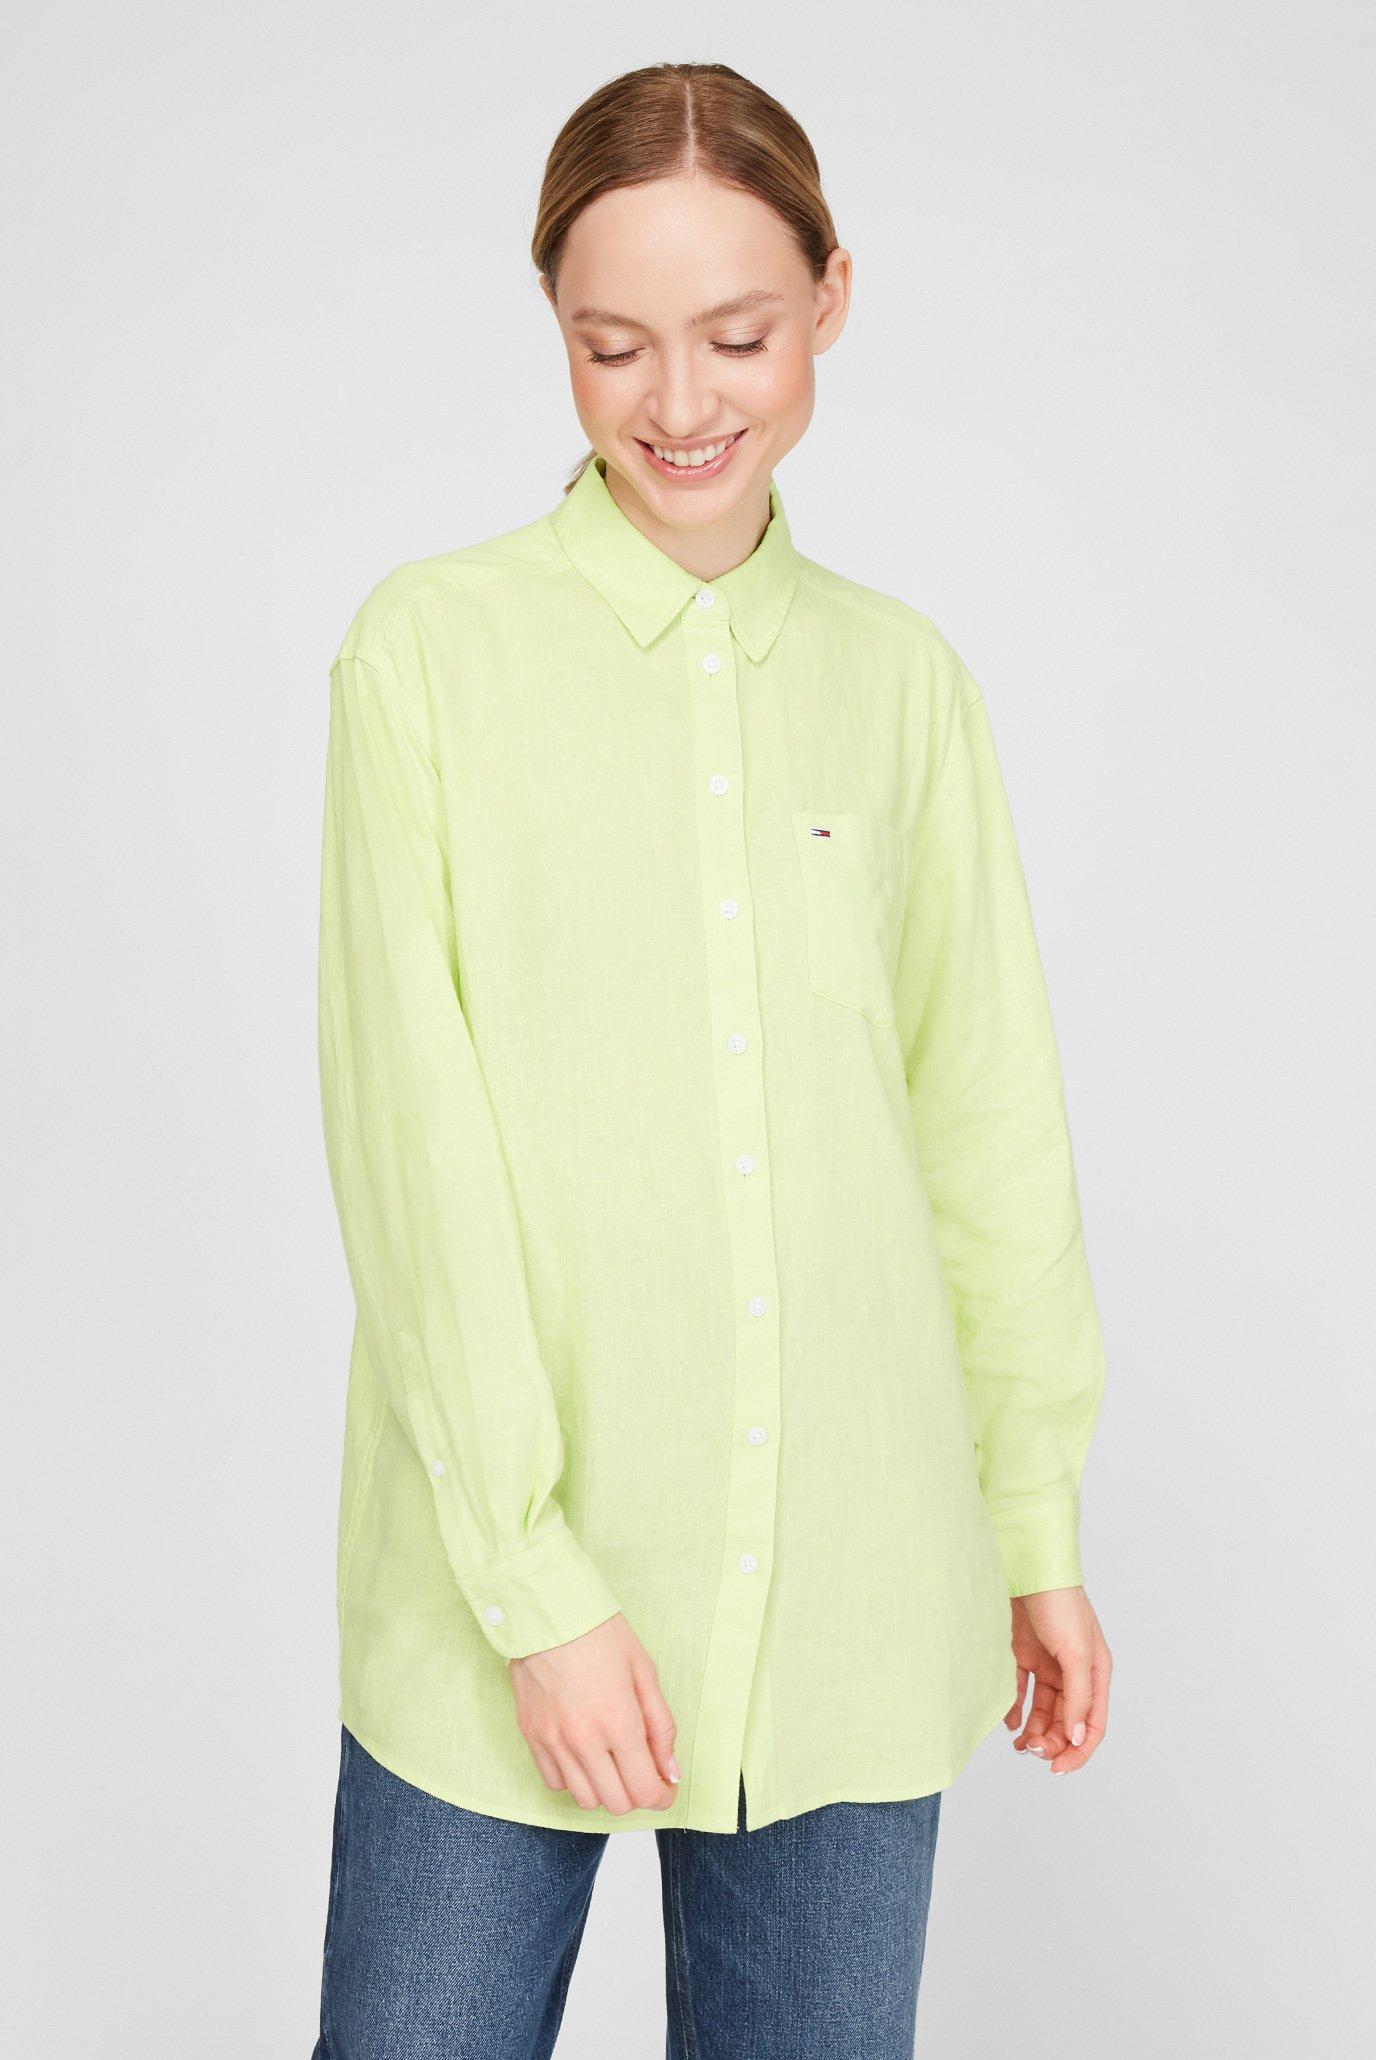 Женская салатовая льняная рубашка 1